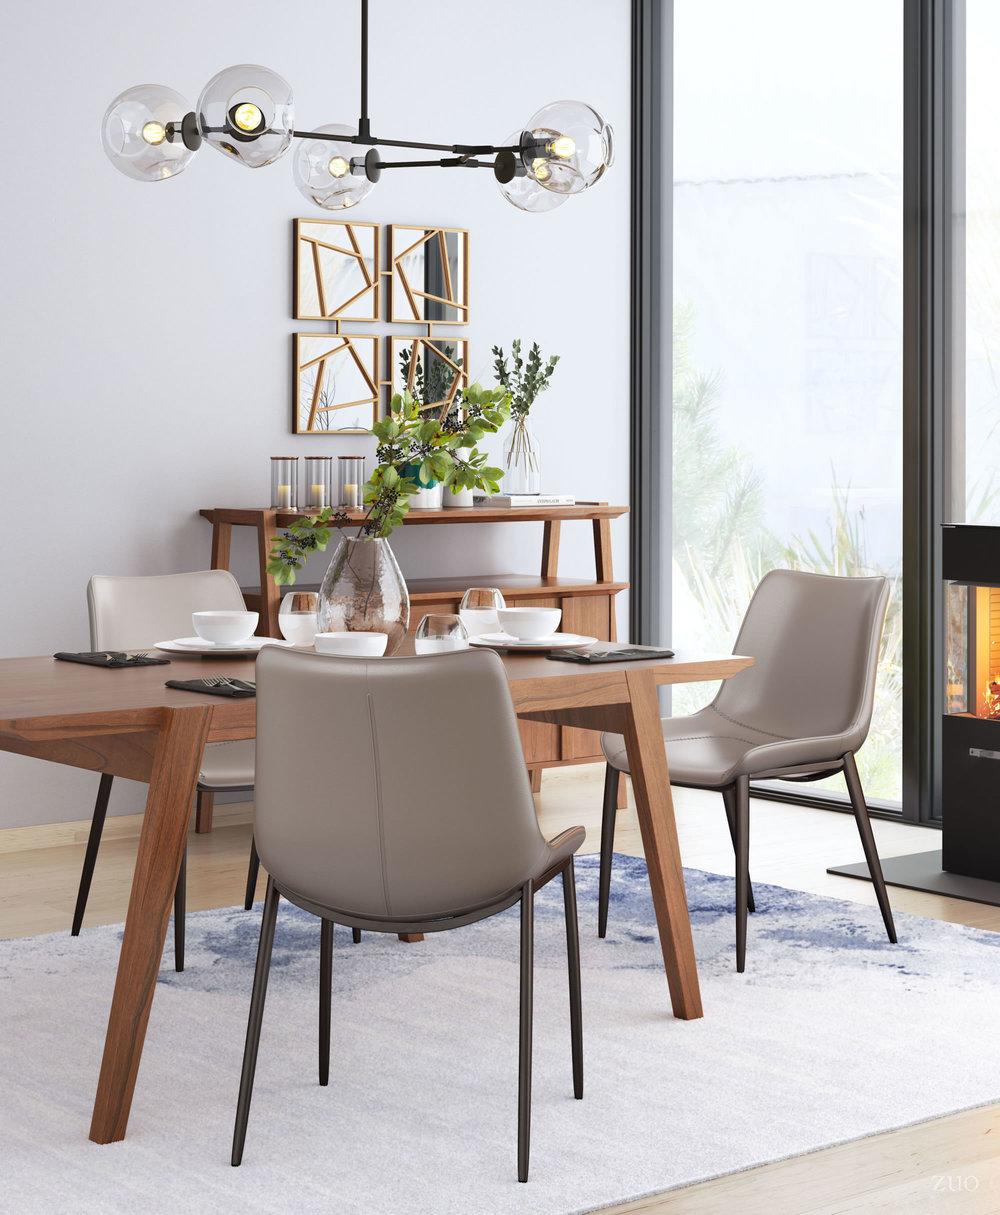 Zuo Modern Contemporary - Magnus Dining Chair - Set of 2 - Gray & Walnut